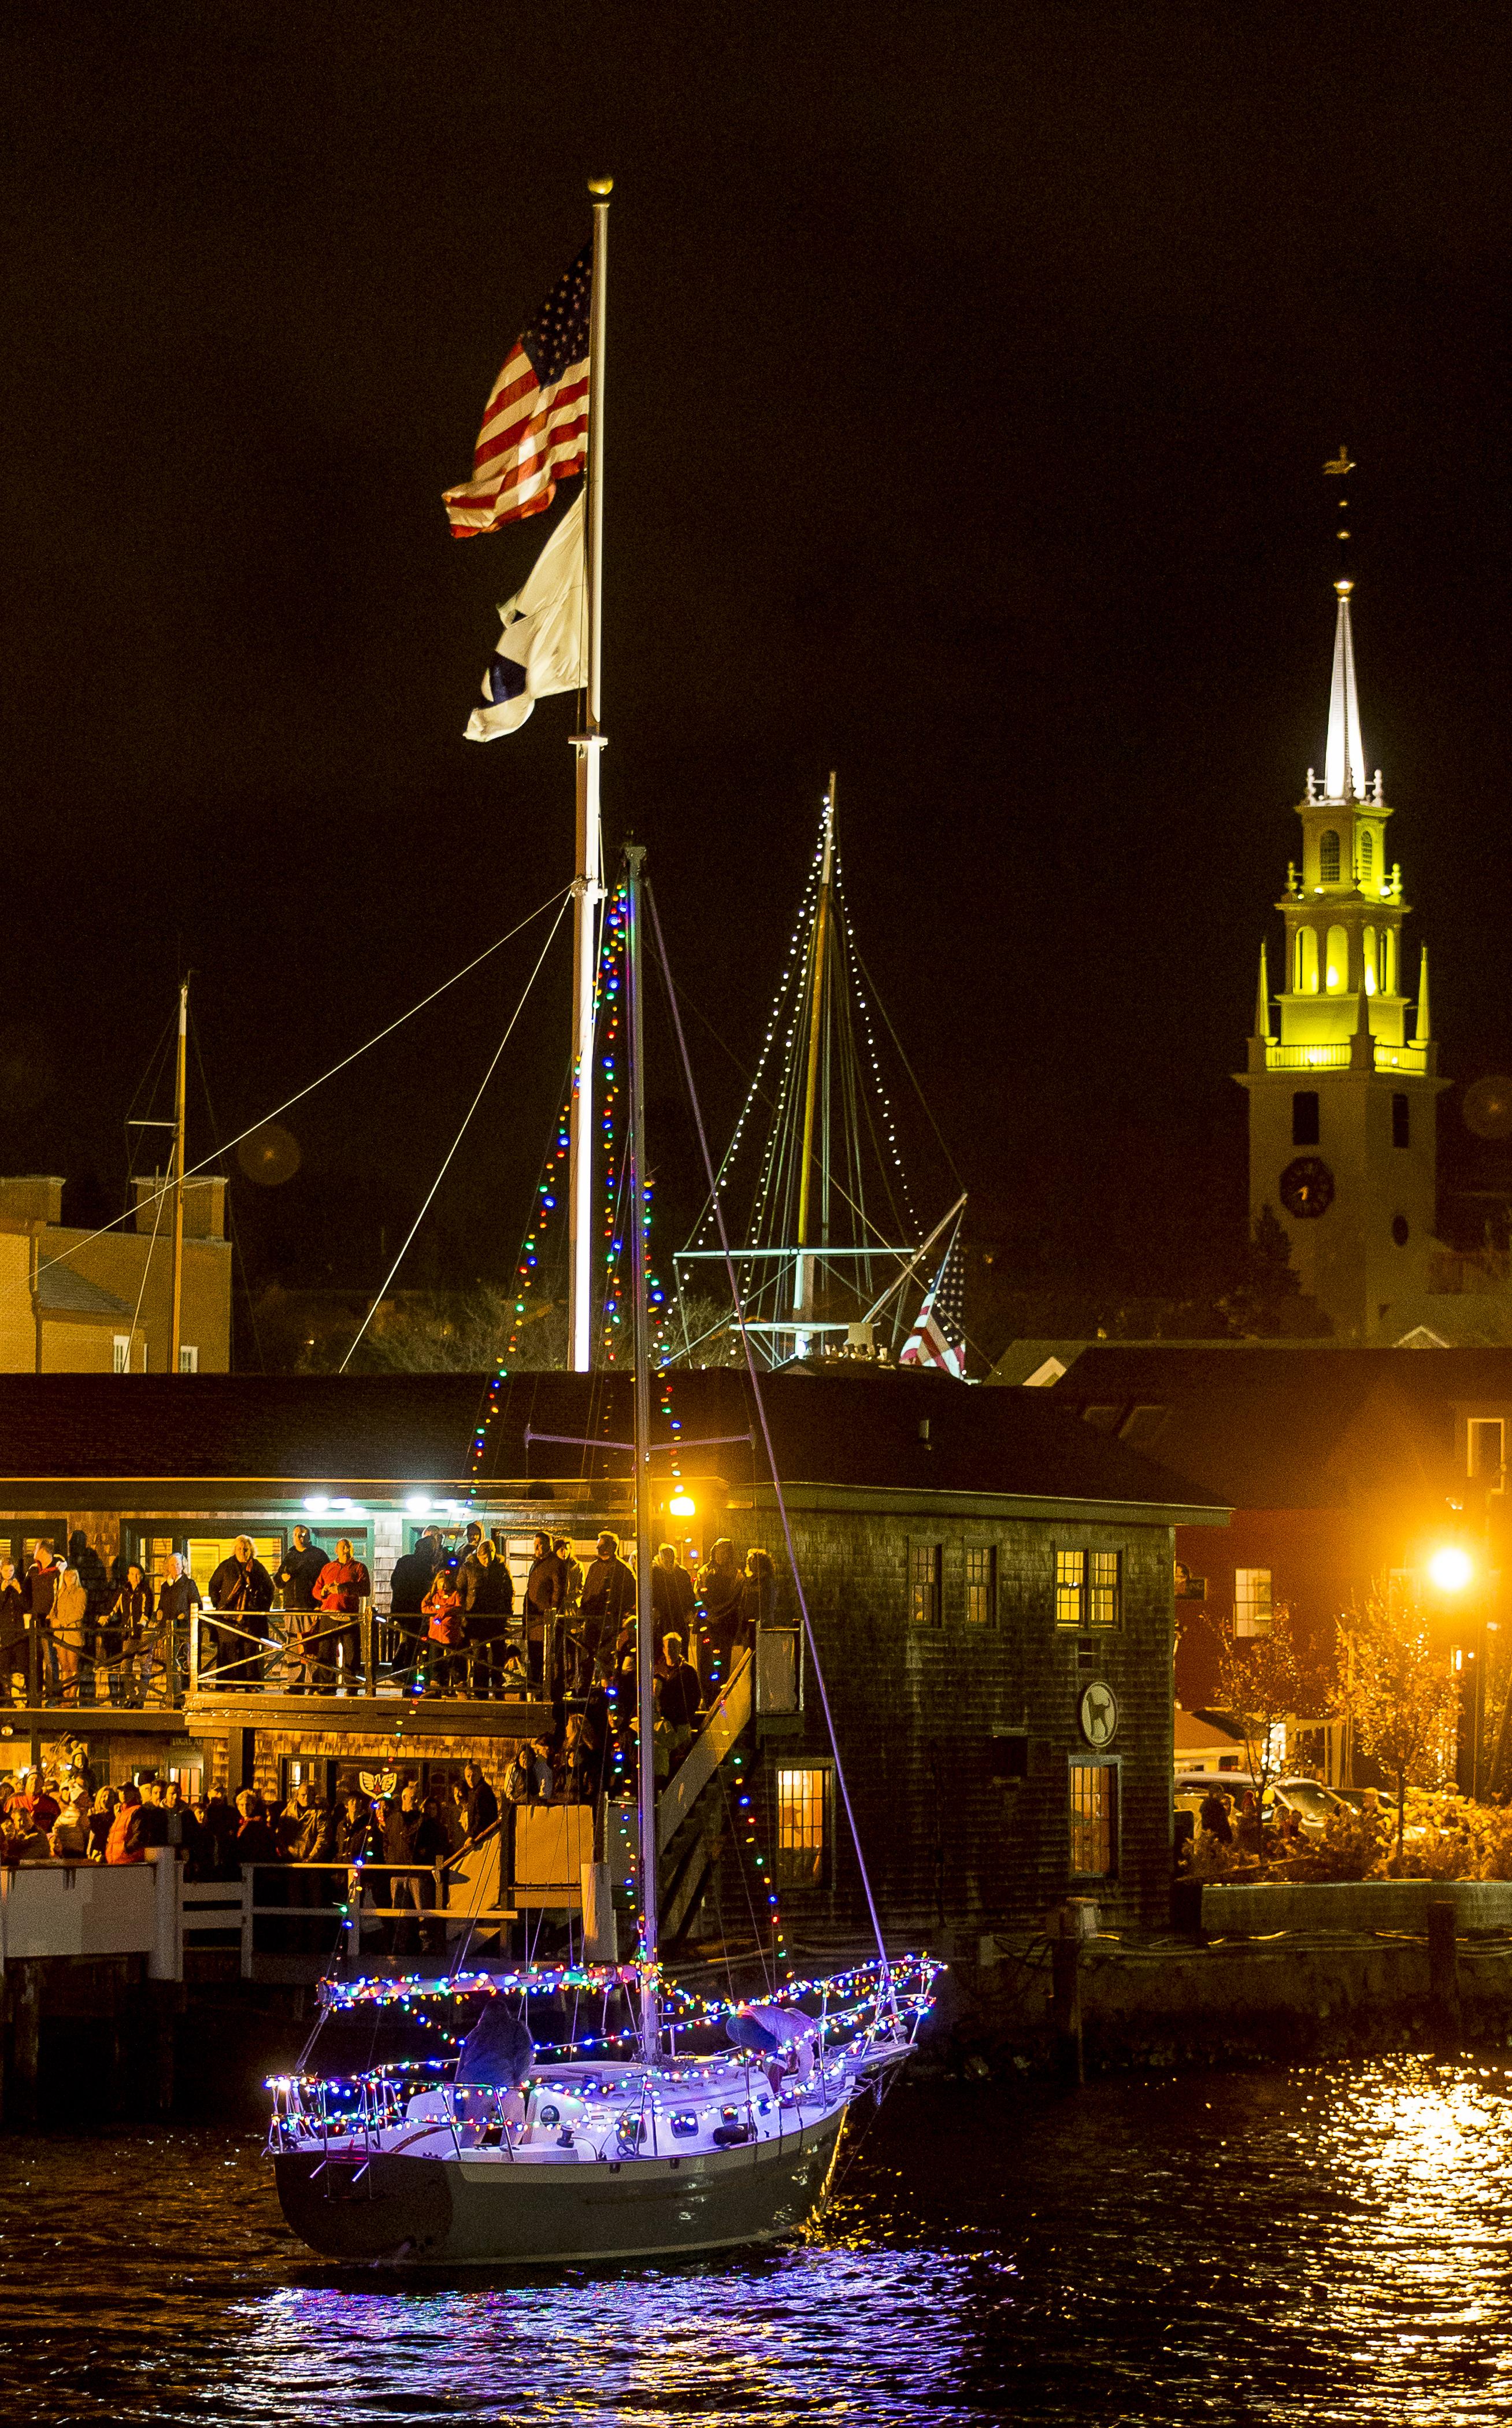 boat parade_credit Onne van der Wal